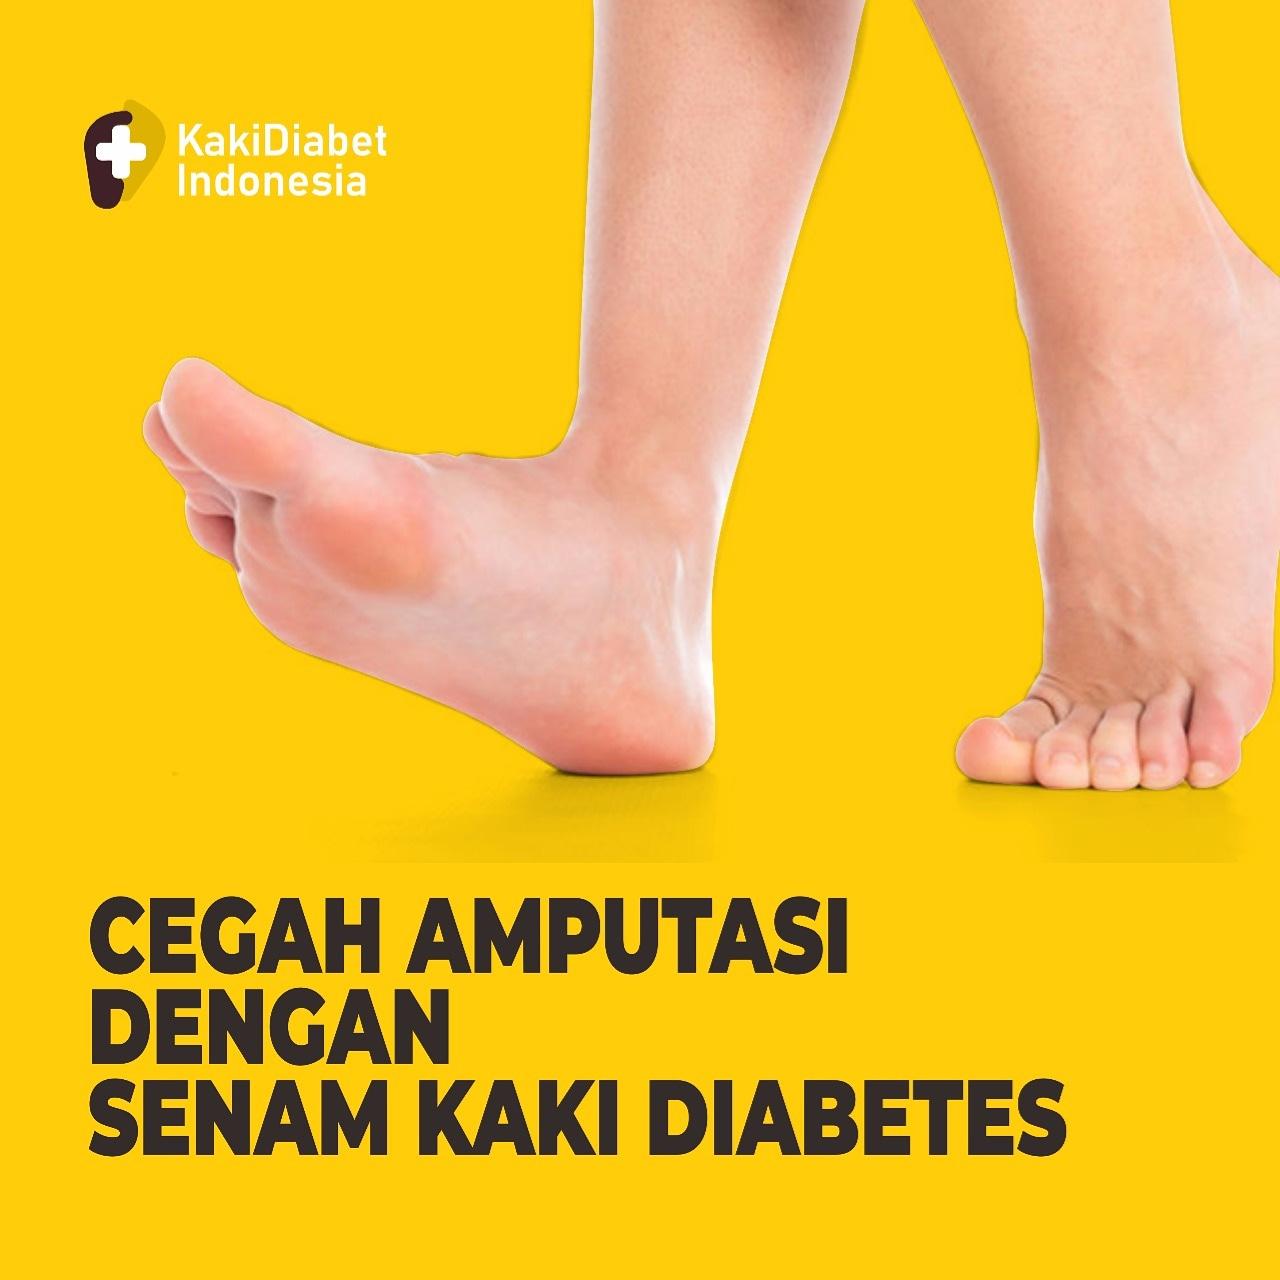 https://kakidiabetindonesia.com/images/blog/BLOG__pentingnya-senam-kaki-diabetet-bagi-penderita-diabetes-mellitus__20200912042219.jpg